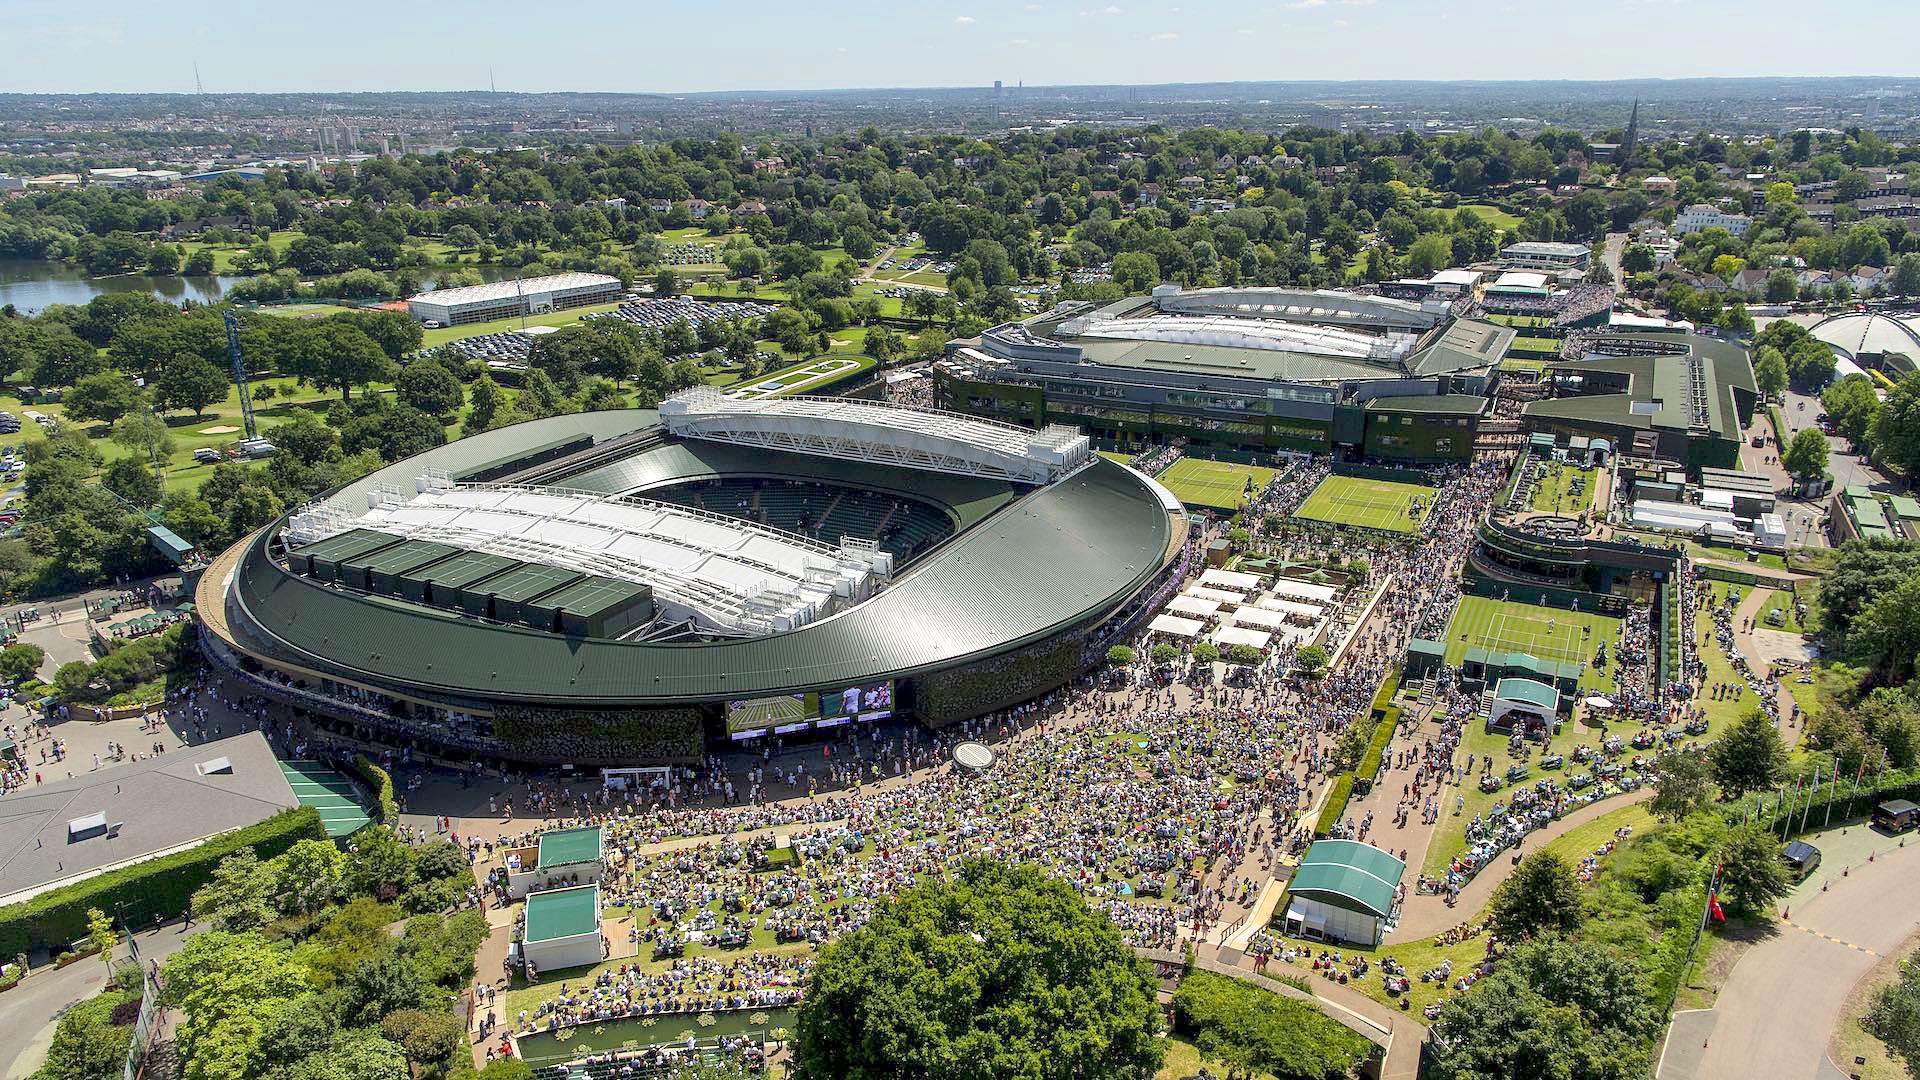 Wimbledon from above by Joe Toth.jpg